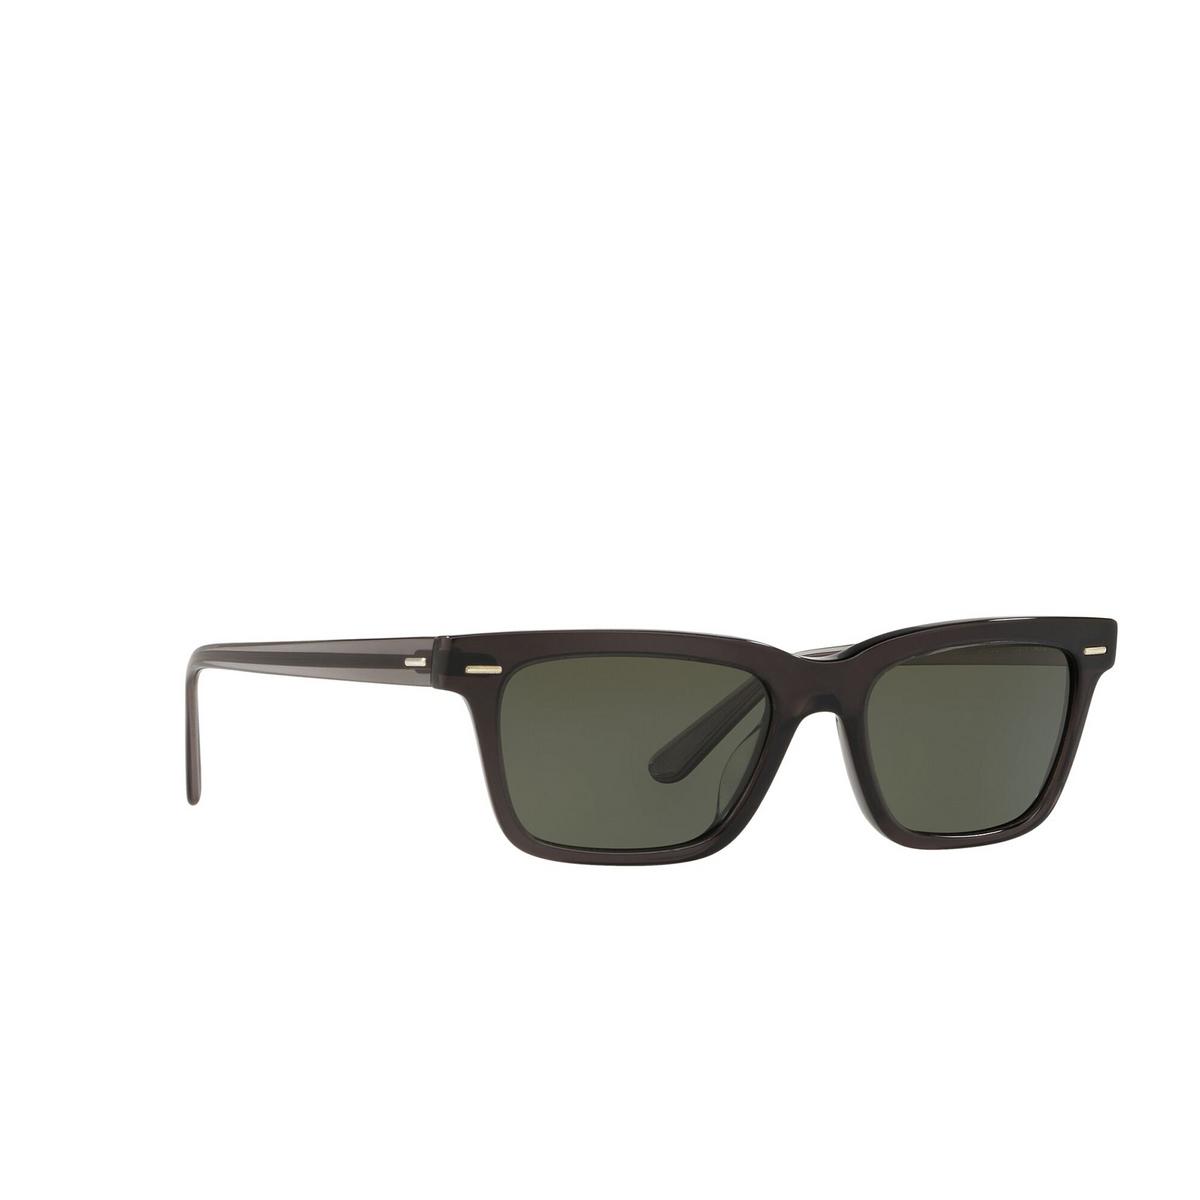 Oliver Peoples® Square Sunglasses: Ba Cc OV5388SU color Vivid Dark Grey 1665P1 - three-quarters view.